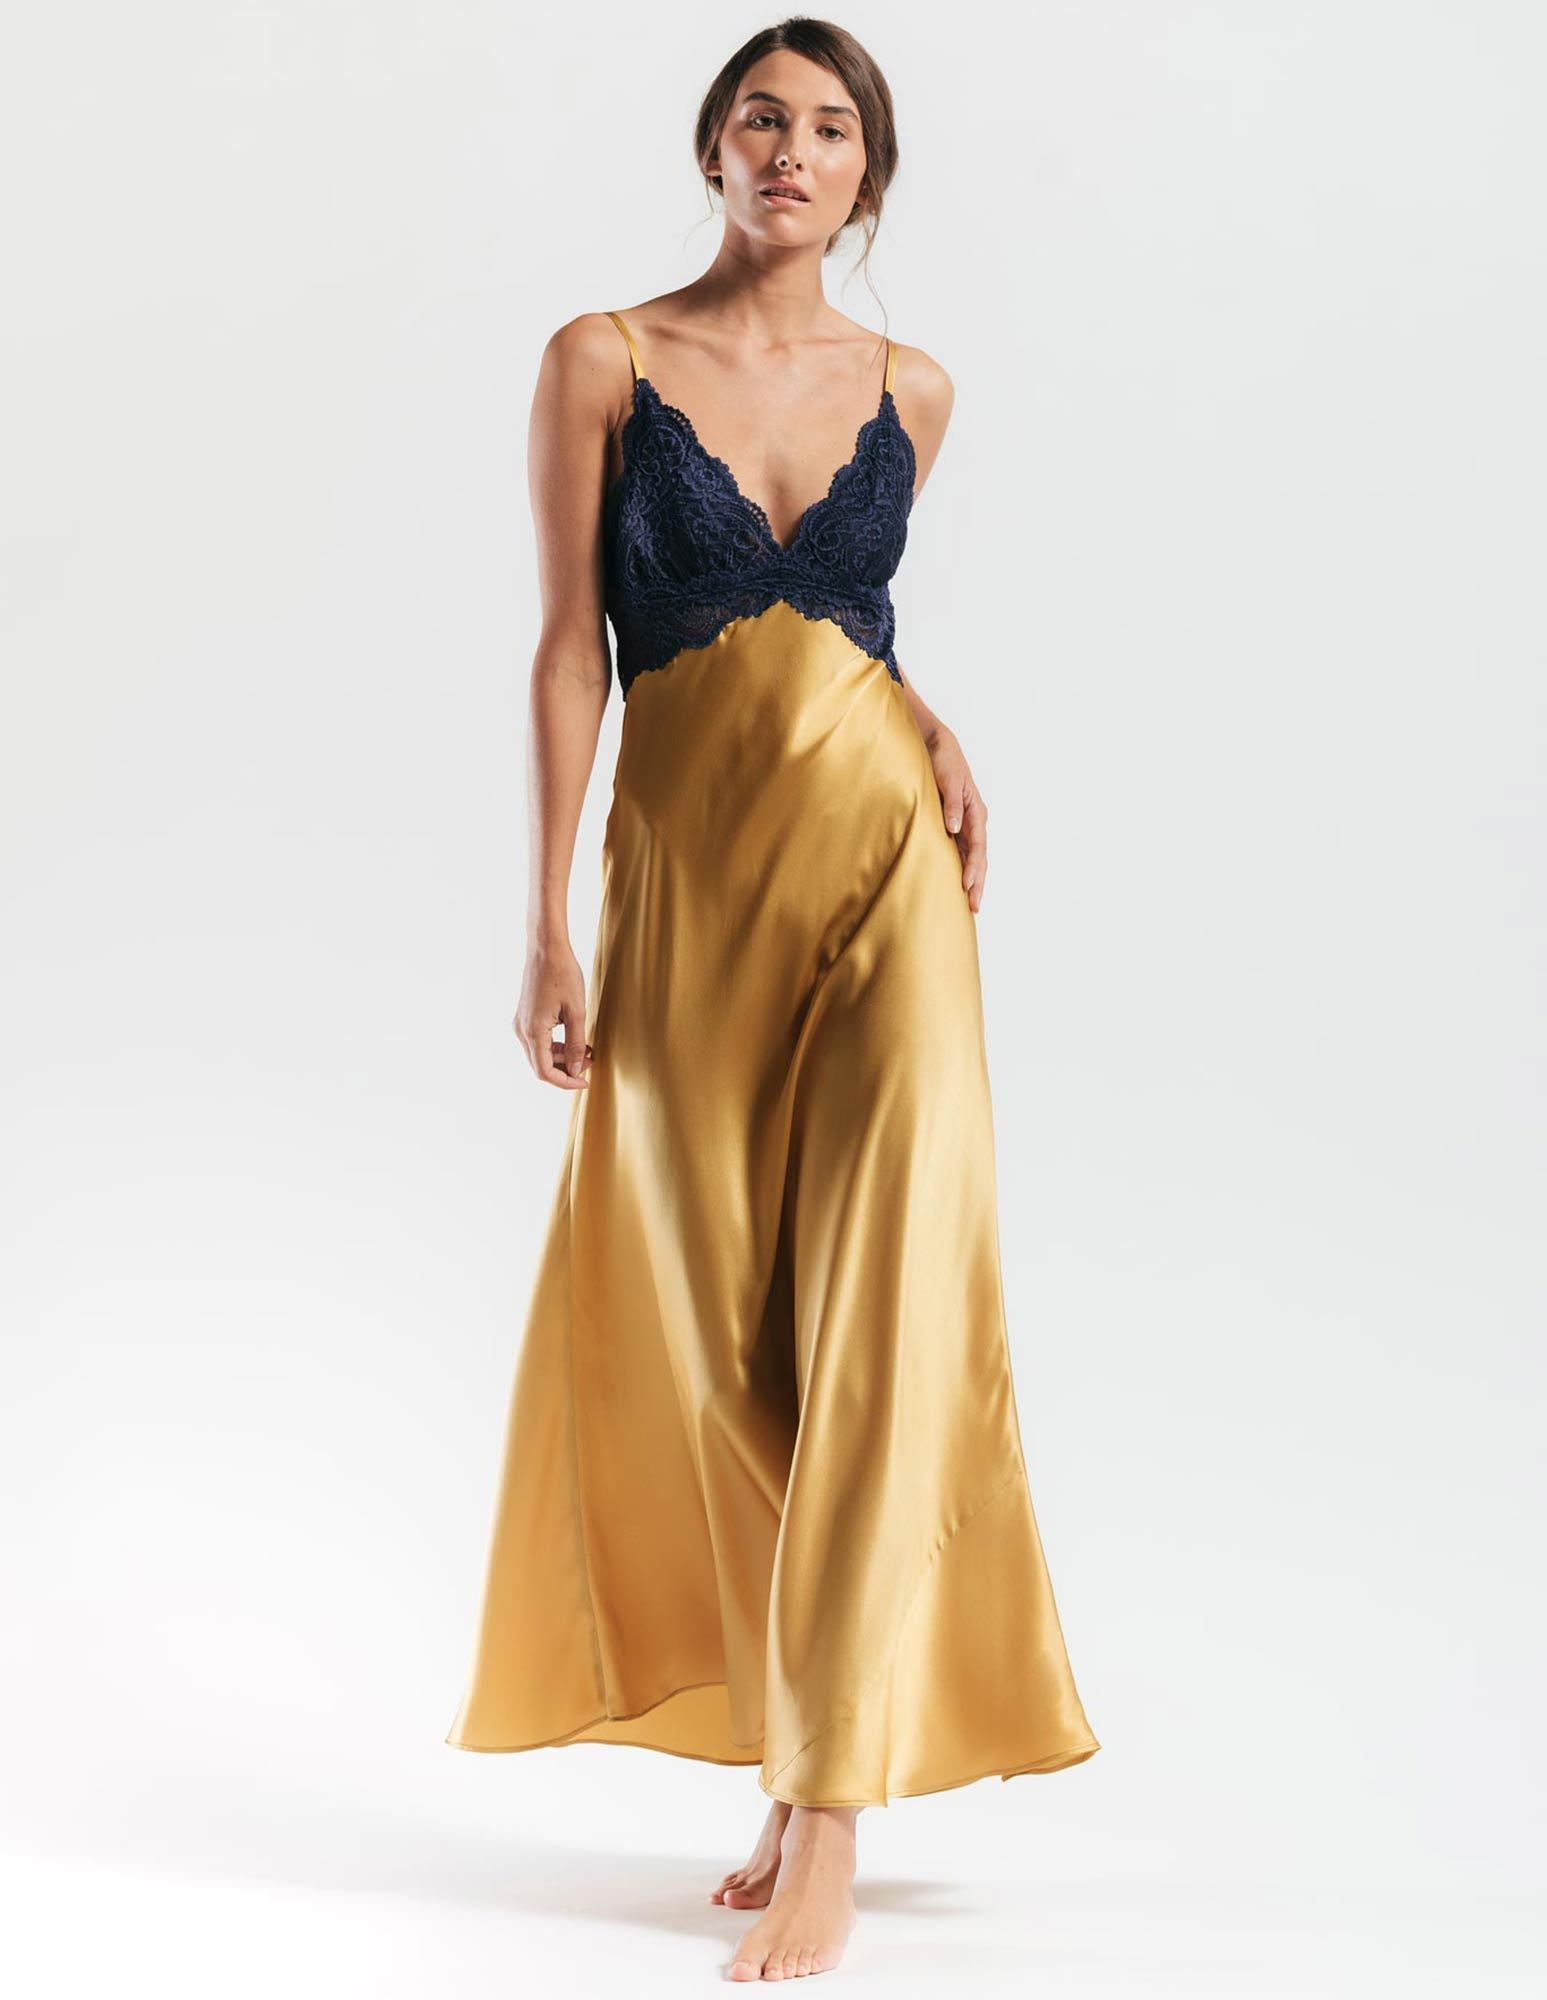 13. Juliette Bust Support Gown $288. S-L